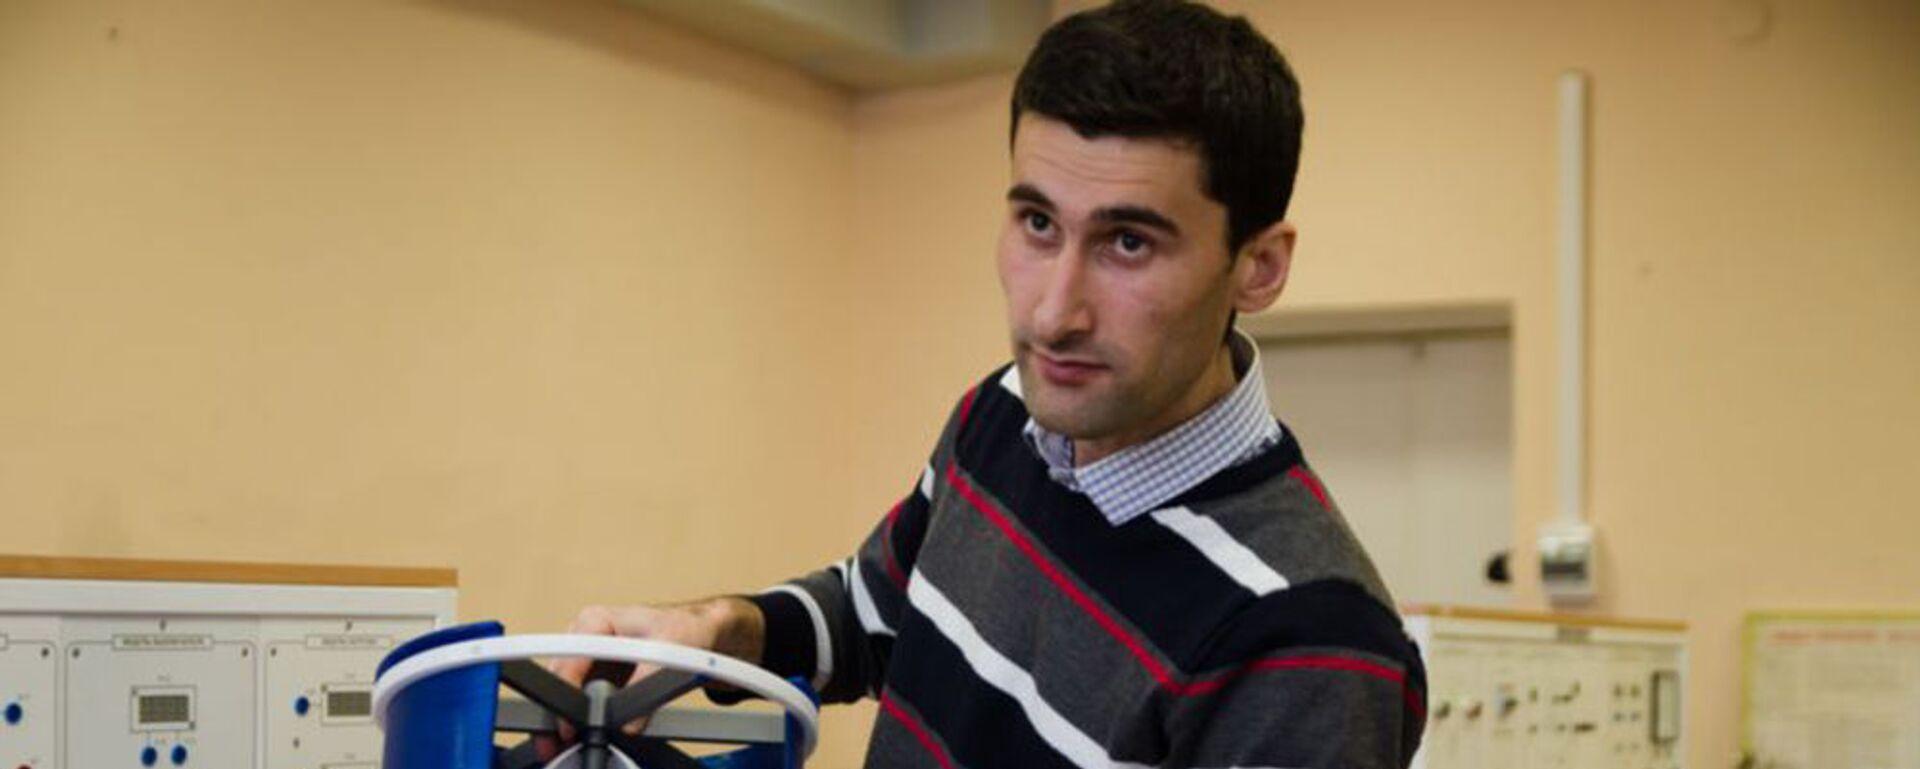 Дилшод Аминов, аспирант из Таджикистана разработал проект мини-ГЭС - Sputnik Таджикистан, 1920, 08.12.2020